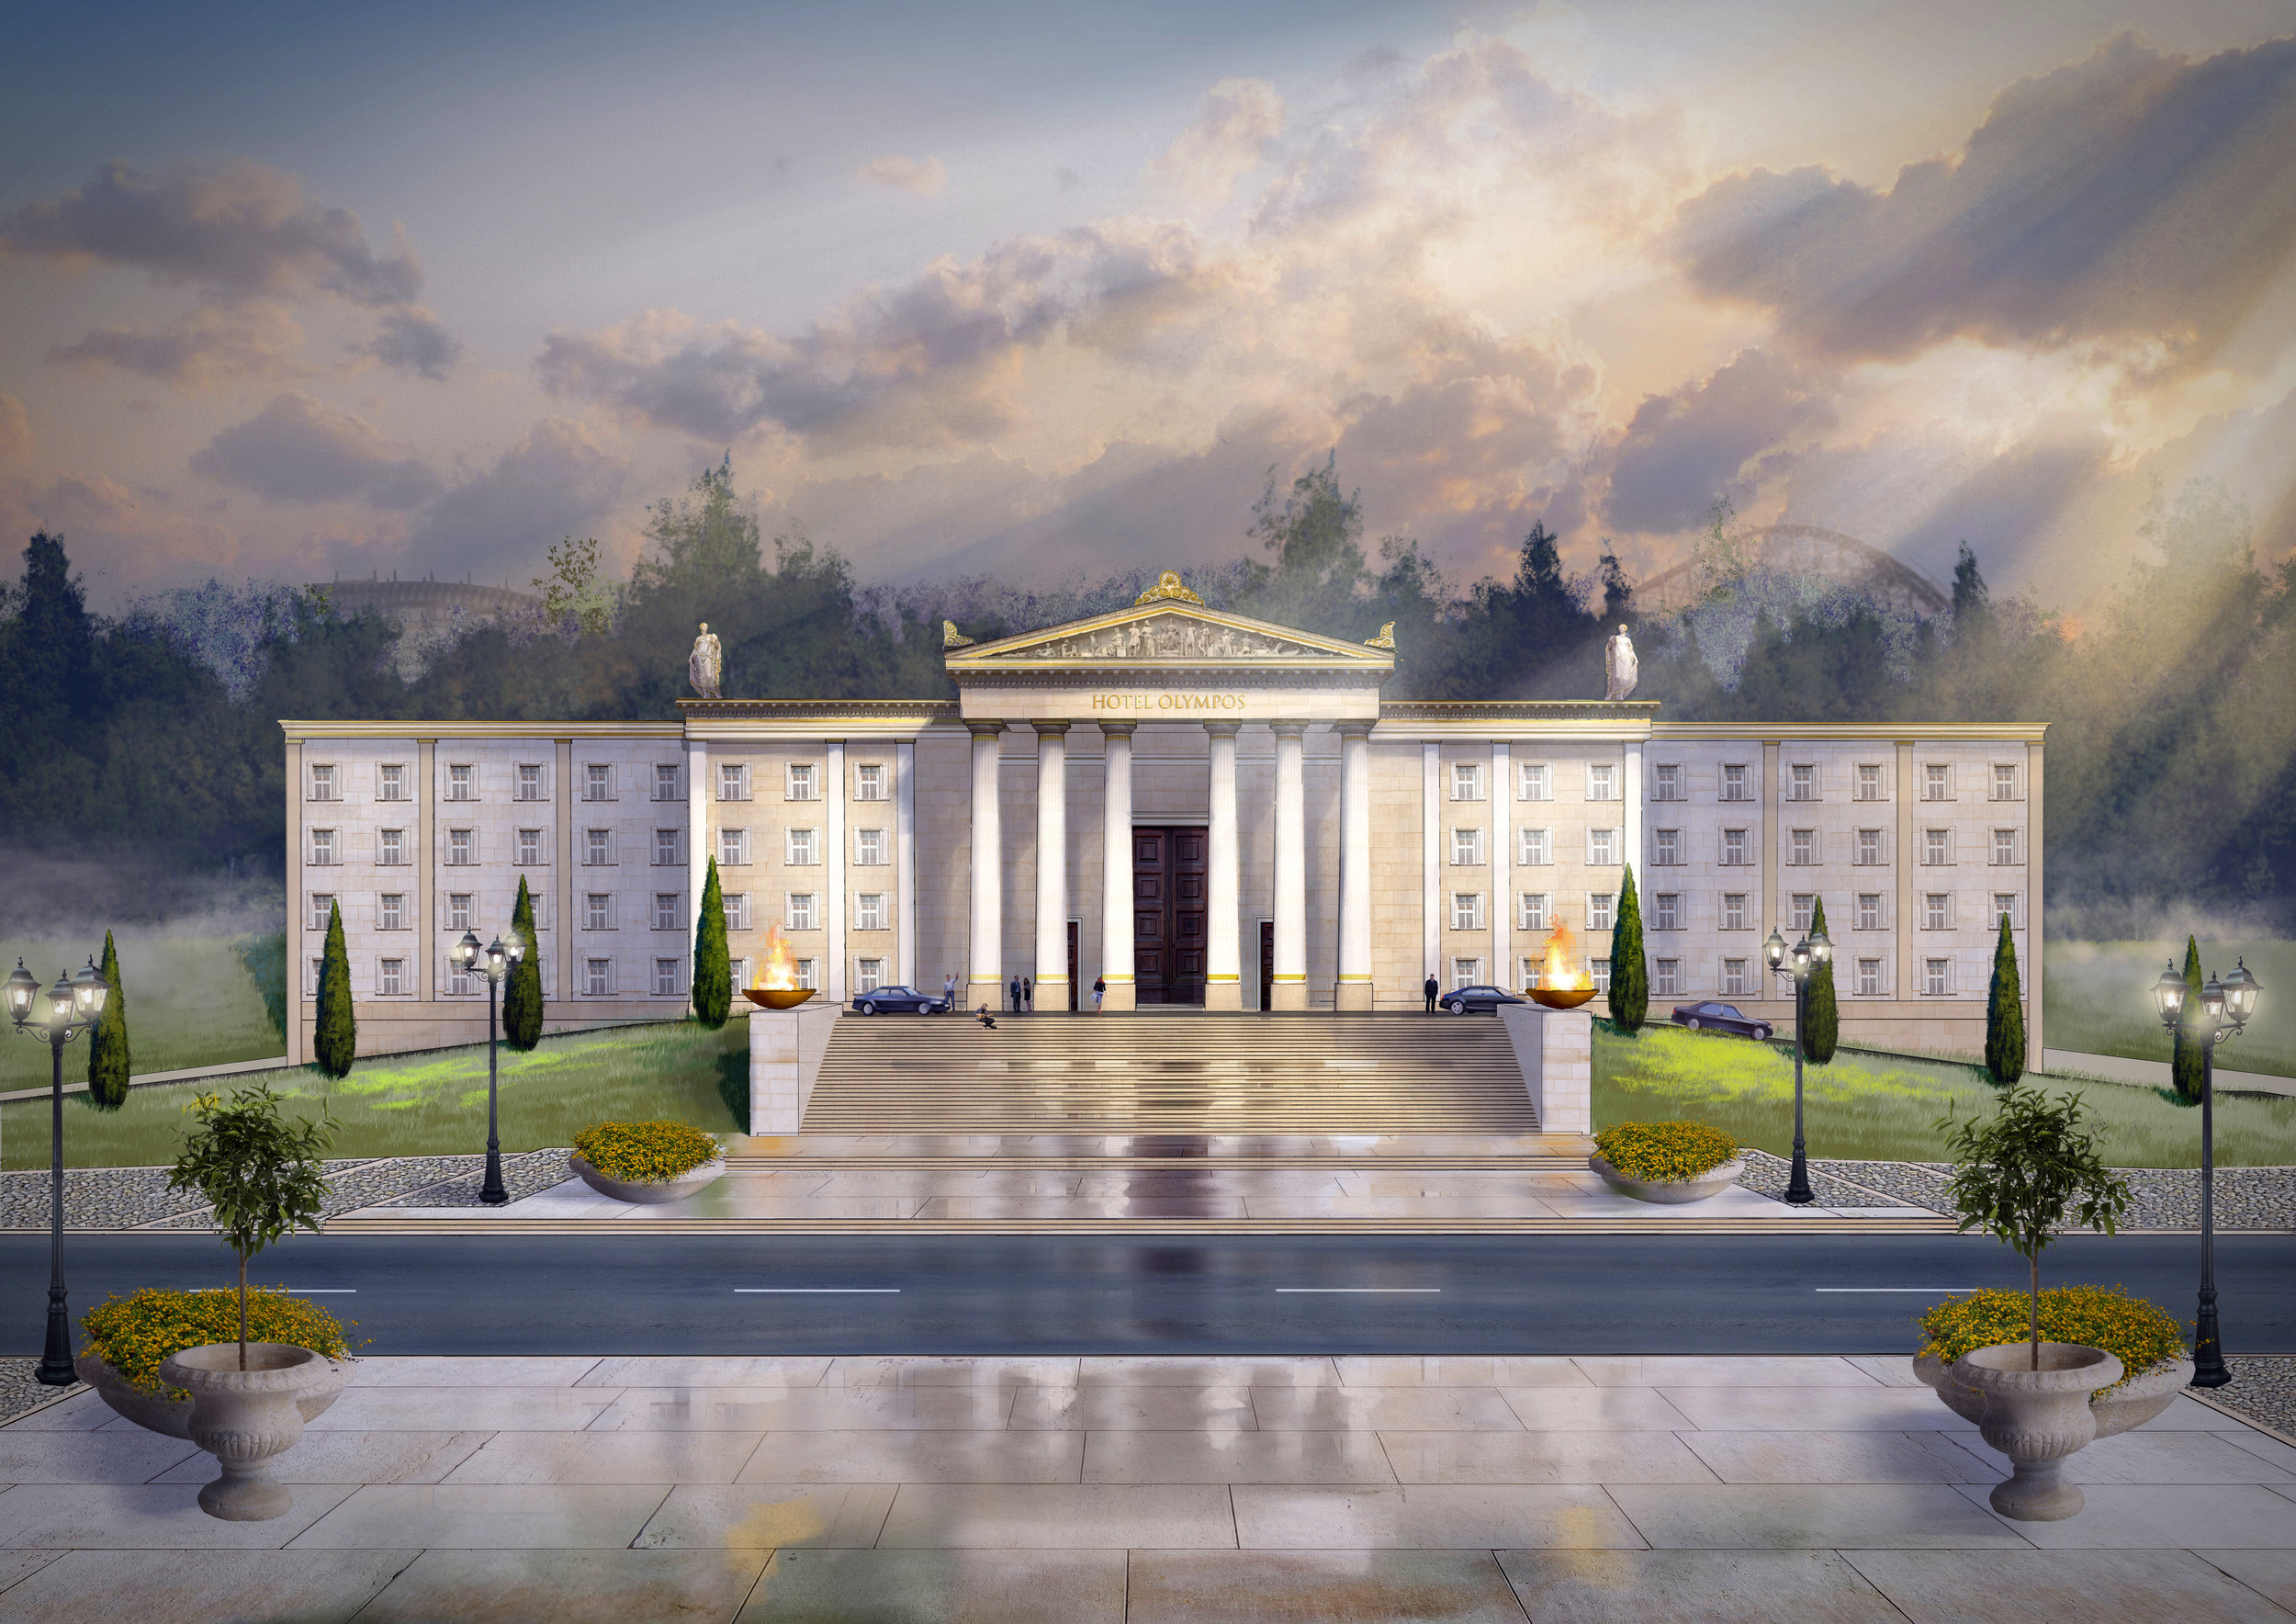 THEME PARK HOTEL CONCEPT <strong>| A concept for a mythical yet whimsical theme park hotel.</strong>